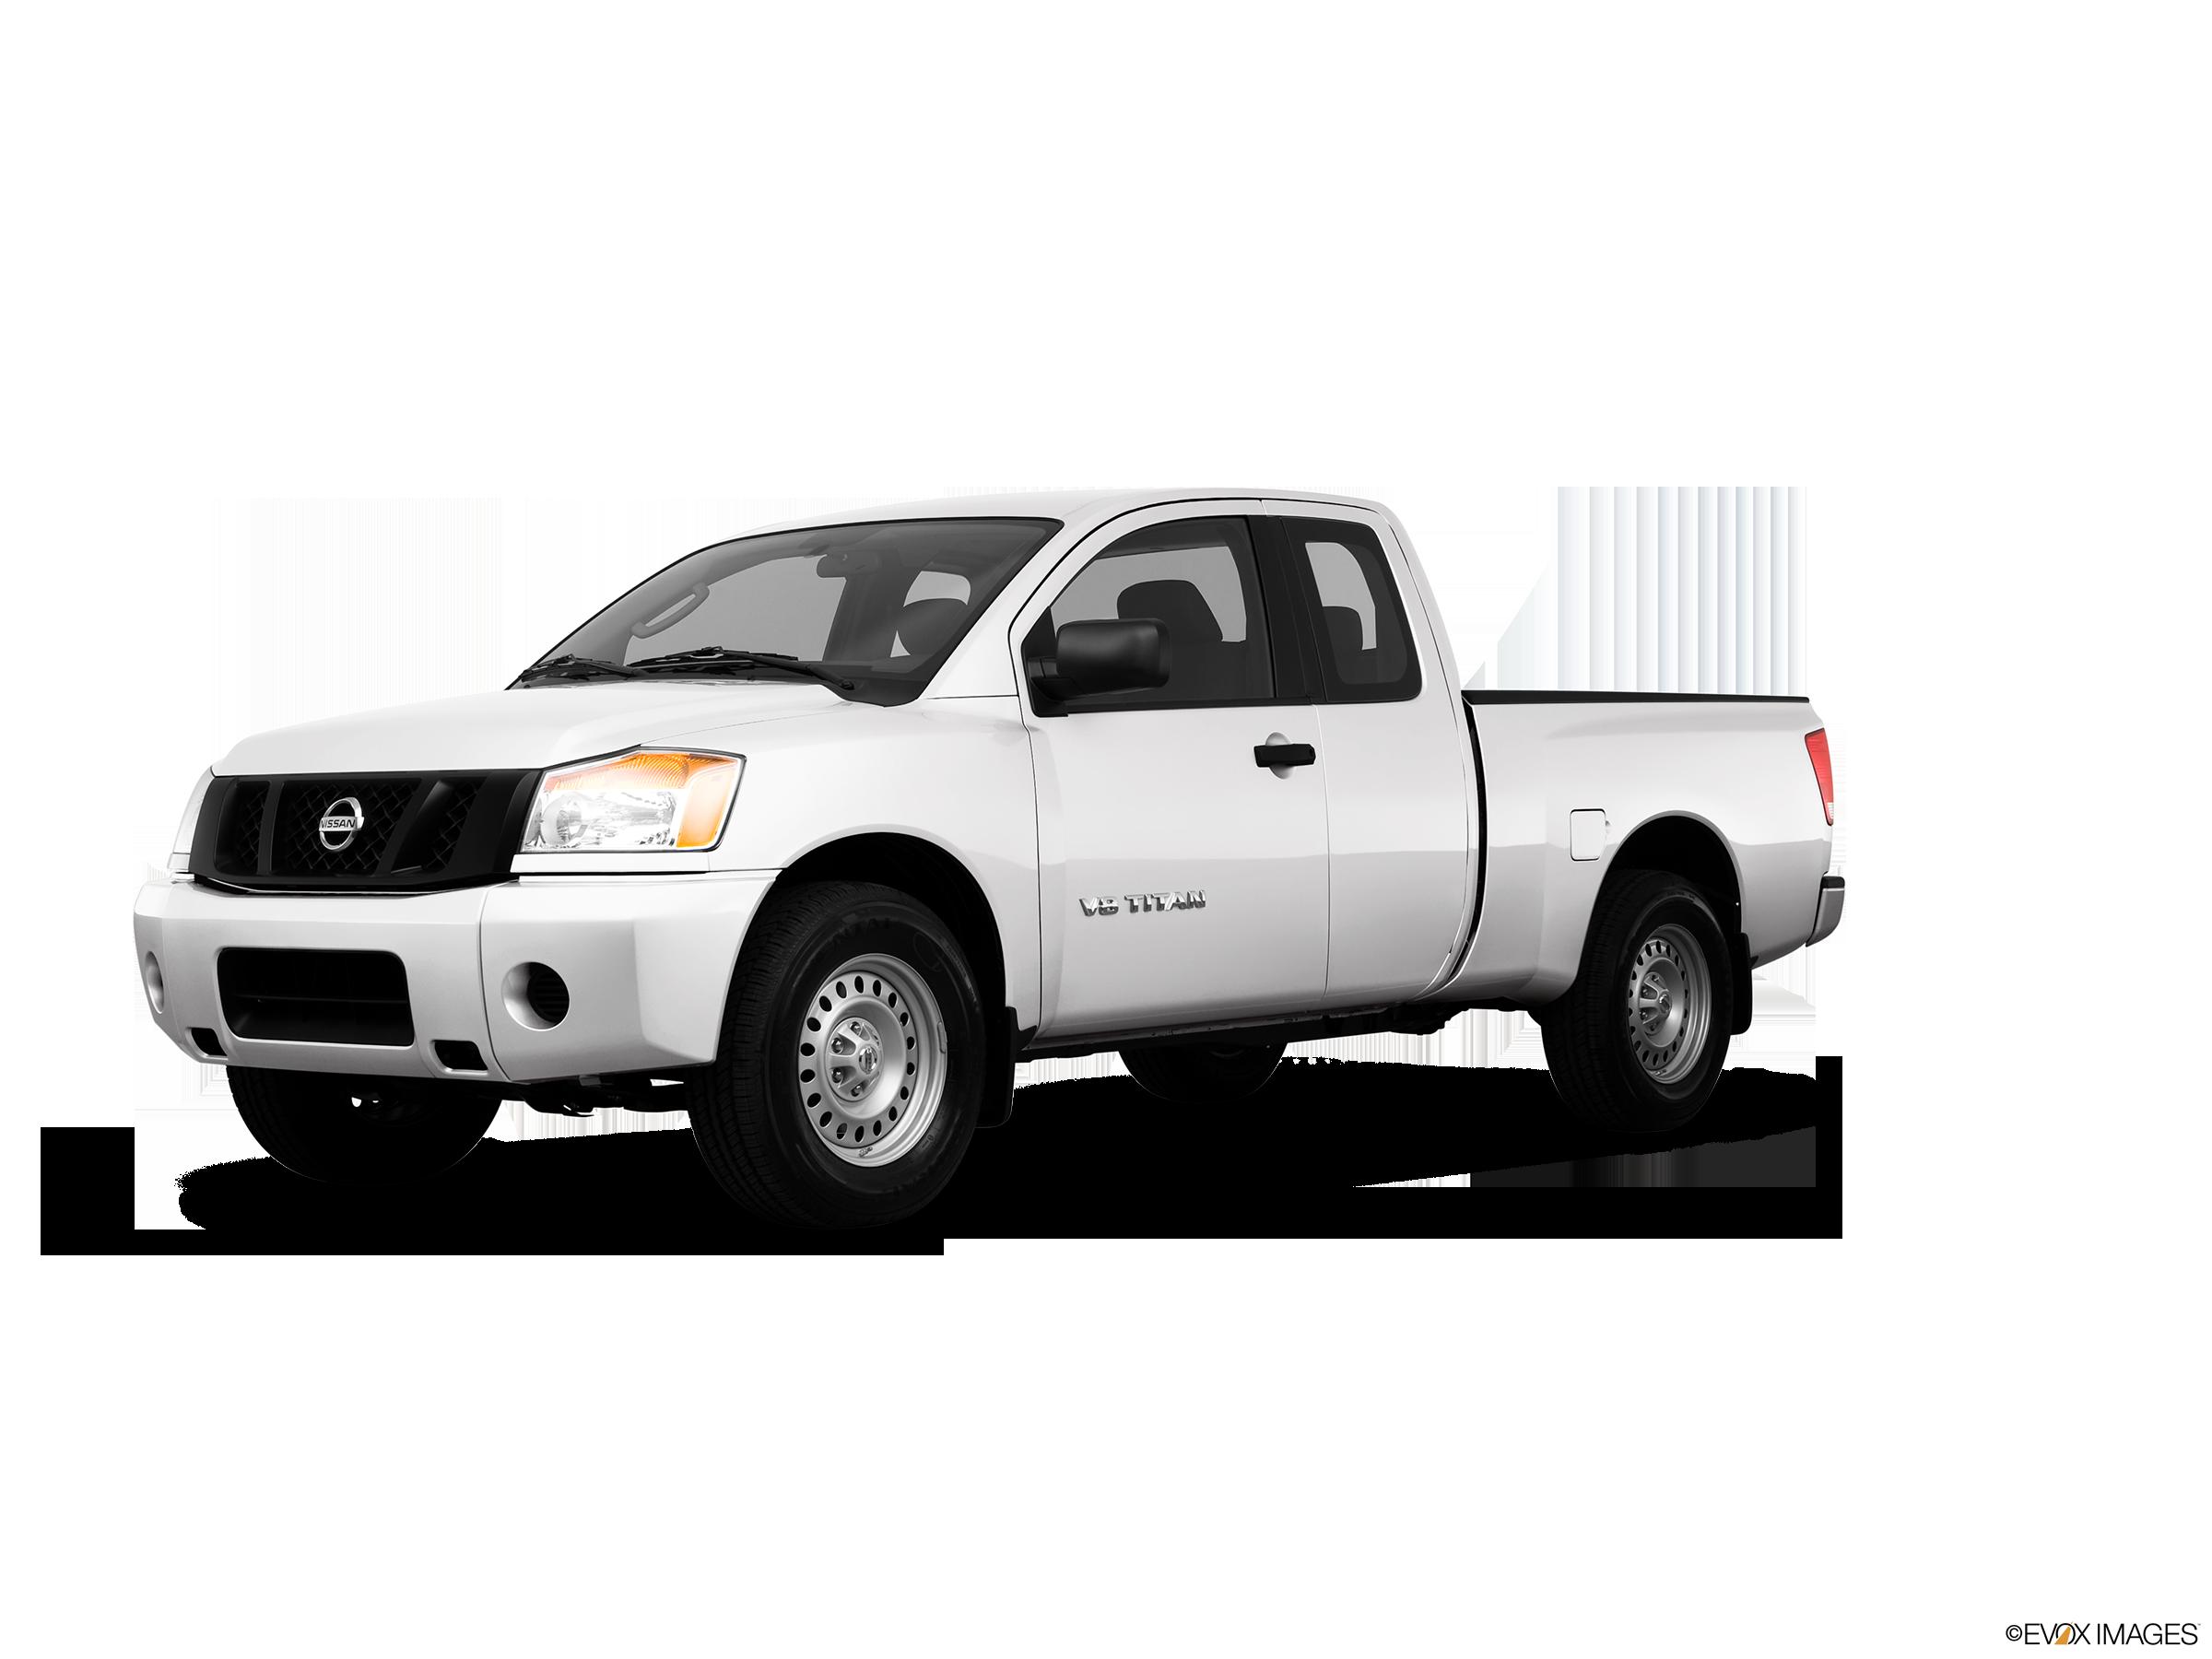 2010 Nissan Titan Values Cars For Sale Kelley Blue Book